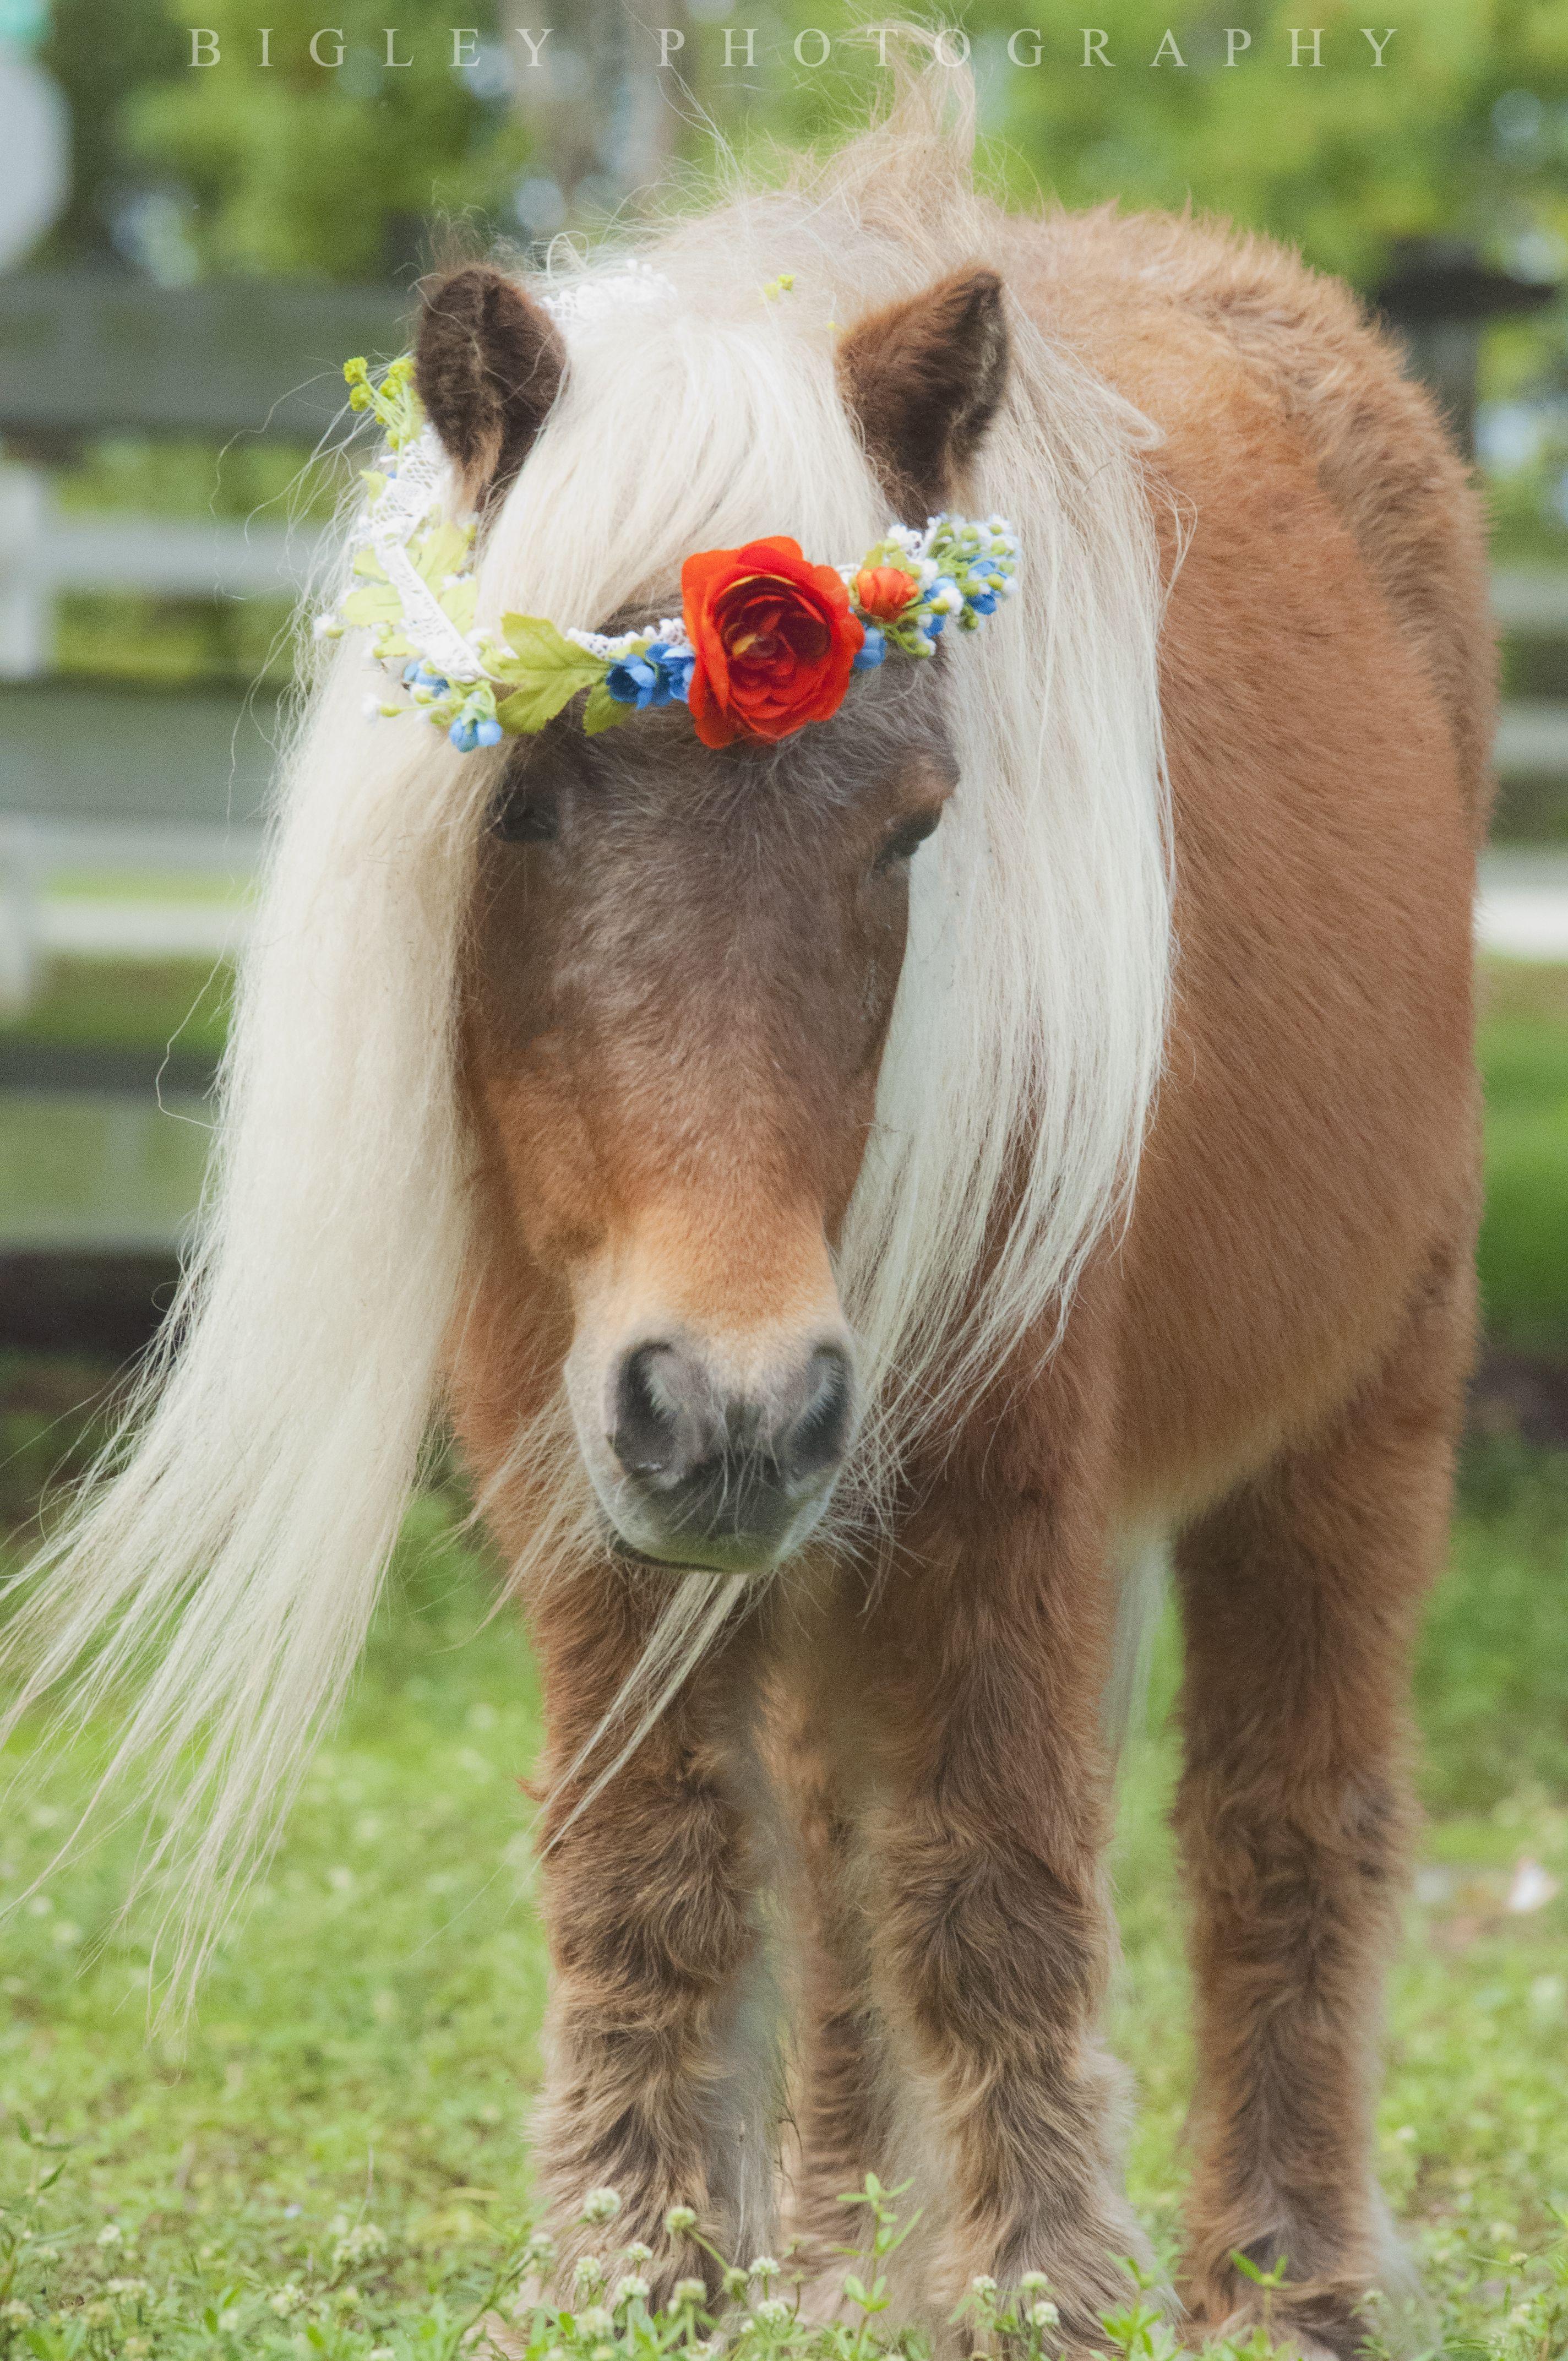 Pin by Jess Chong on My Photography | Horses, Beautiful ...